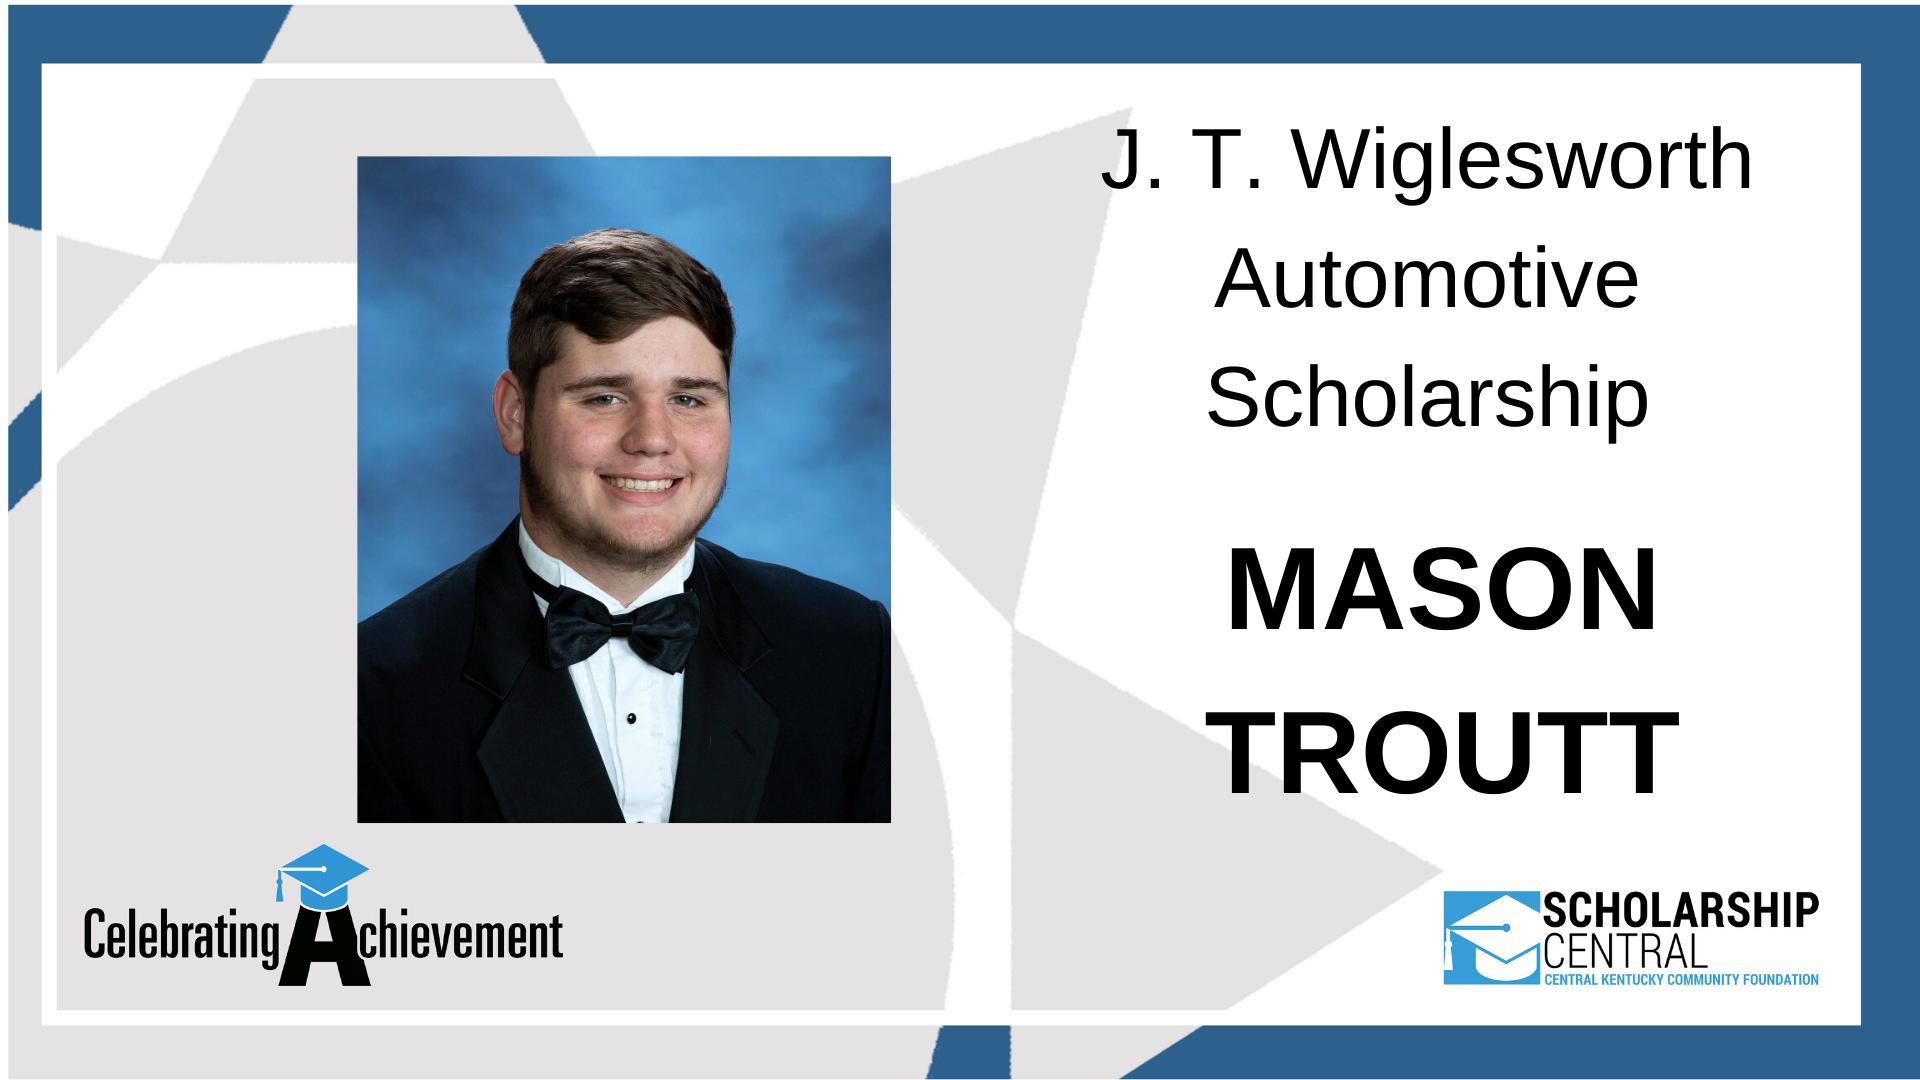 JT Wiglesworth Automotive Scholarship (1)